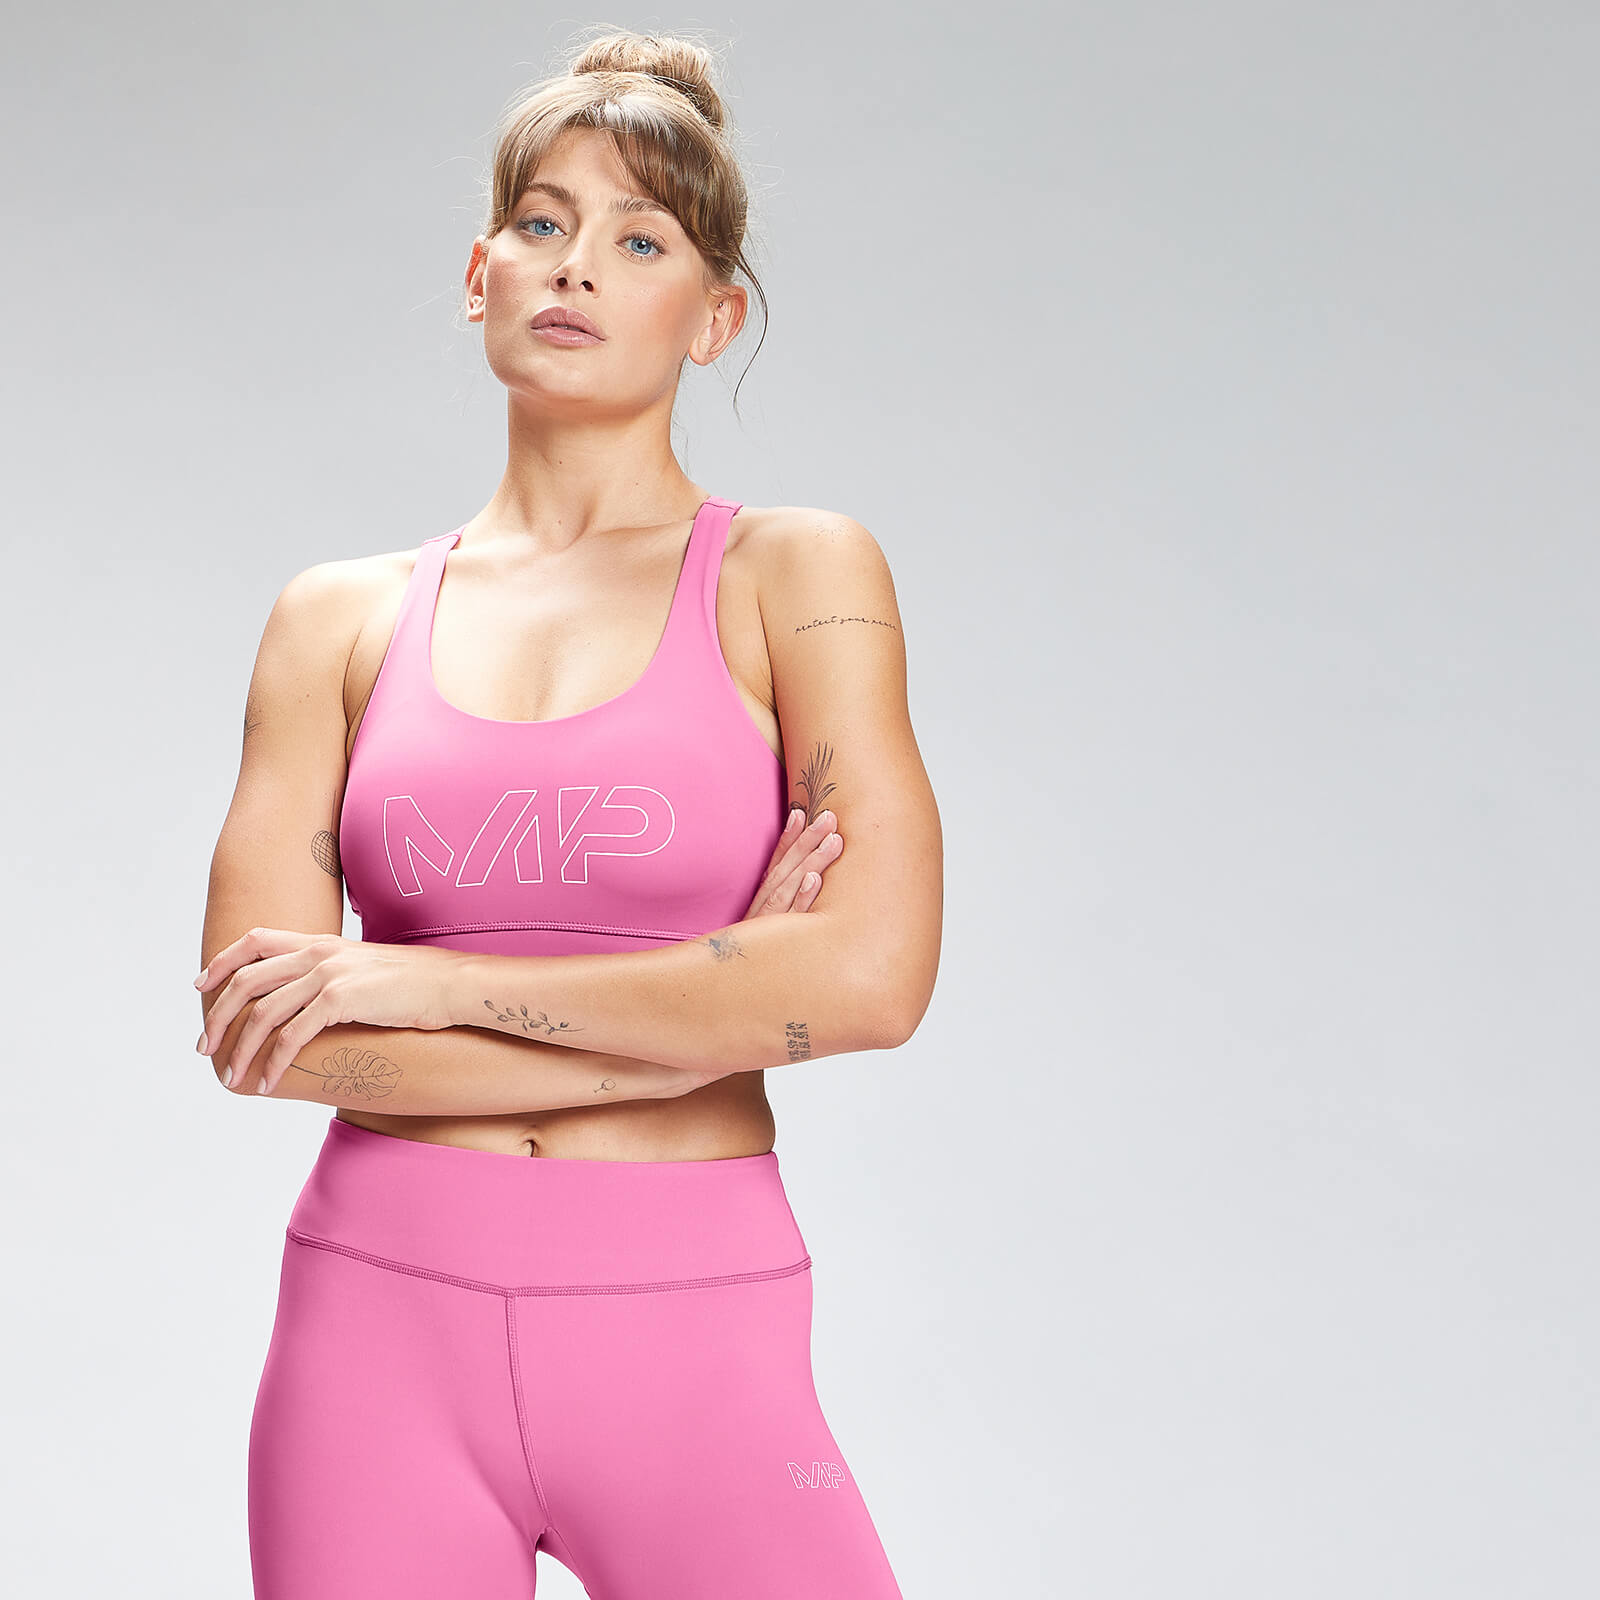 Купить MP Women's Repeat Mark Graphic Training Sports Bra - Pink - XL, Myprotein International